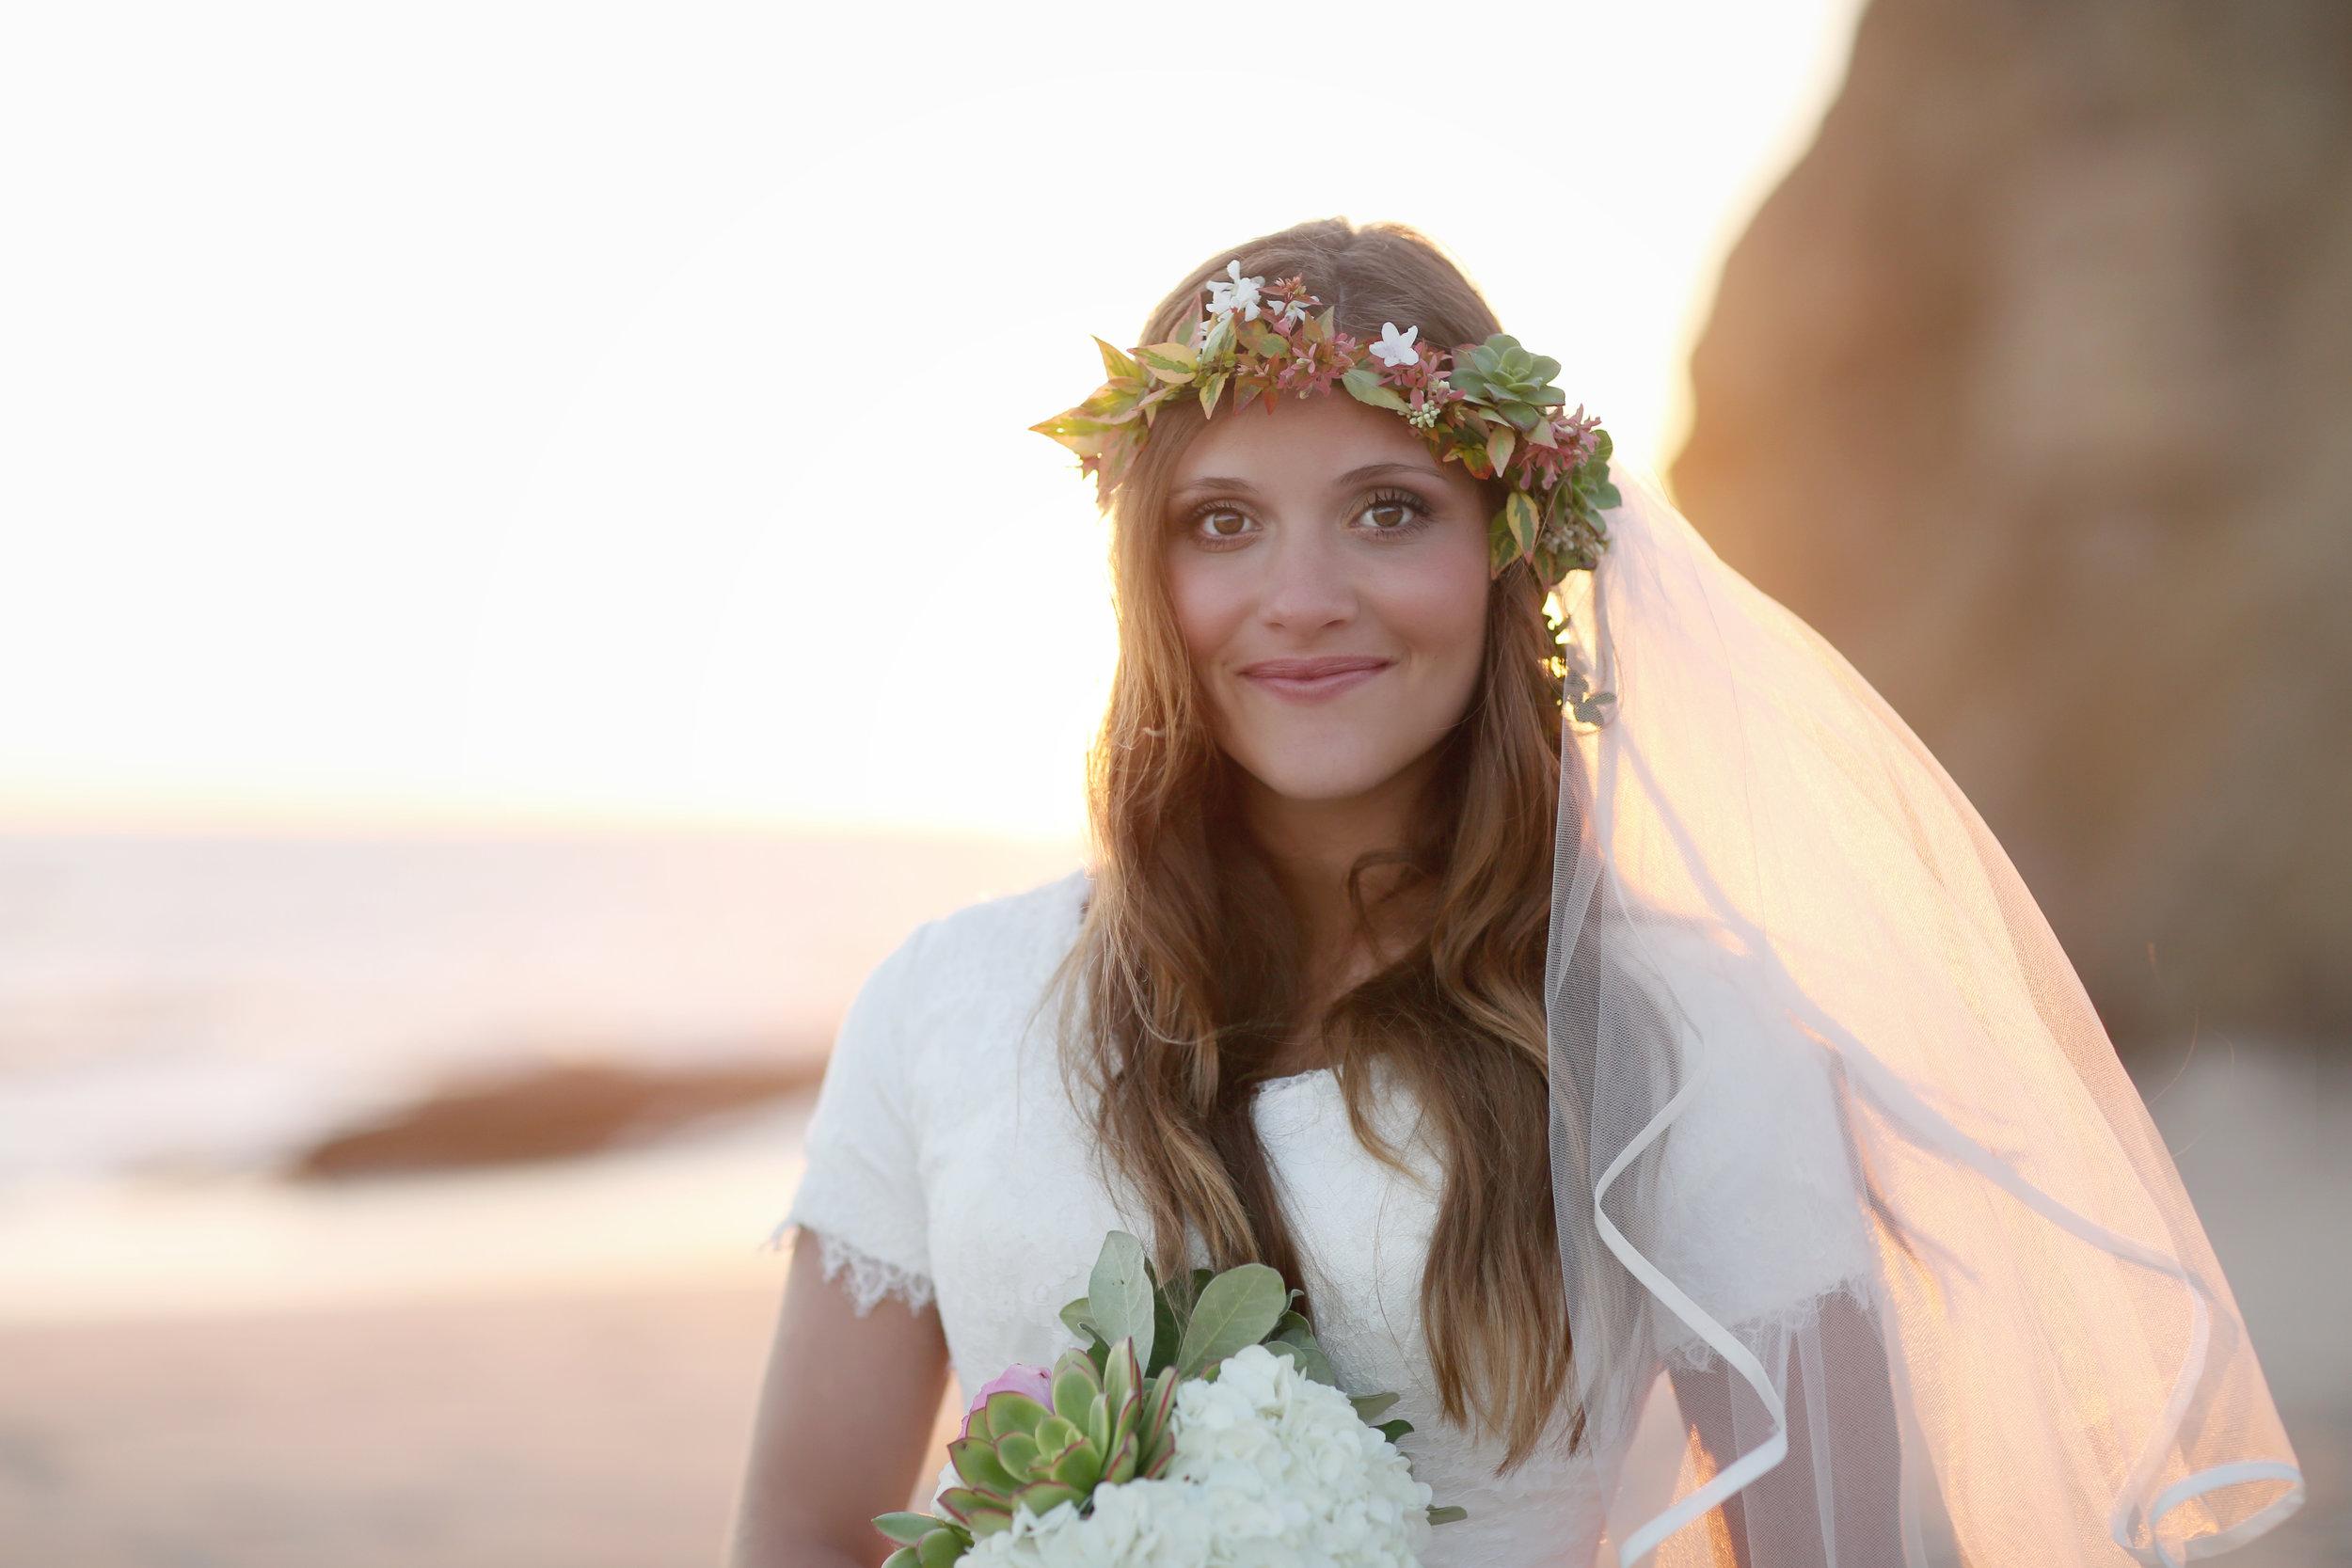 Orange County Beach Wedding - Orange County Wedding Photographer - Bleudog Fotography